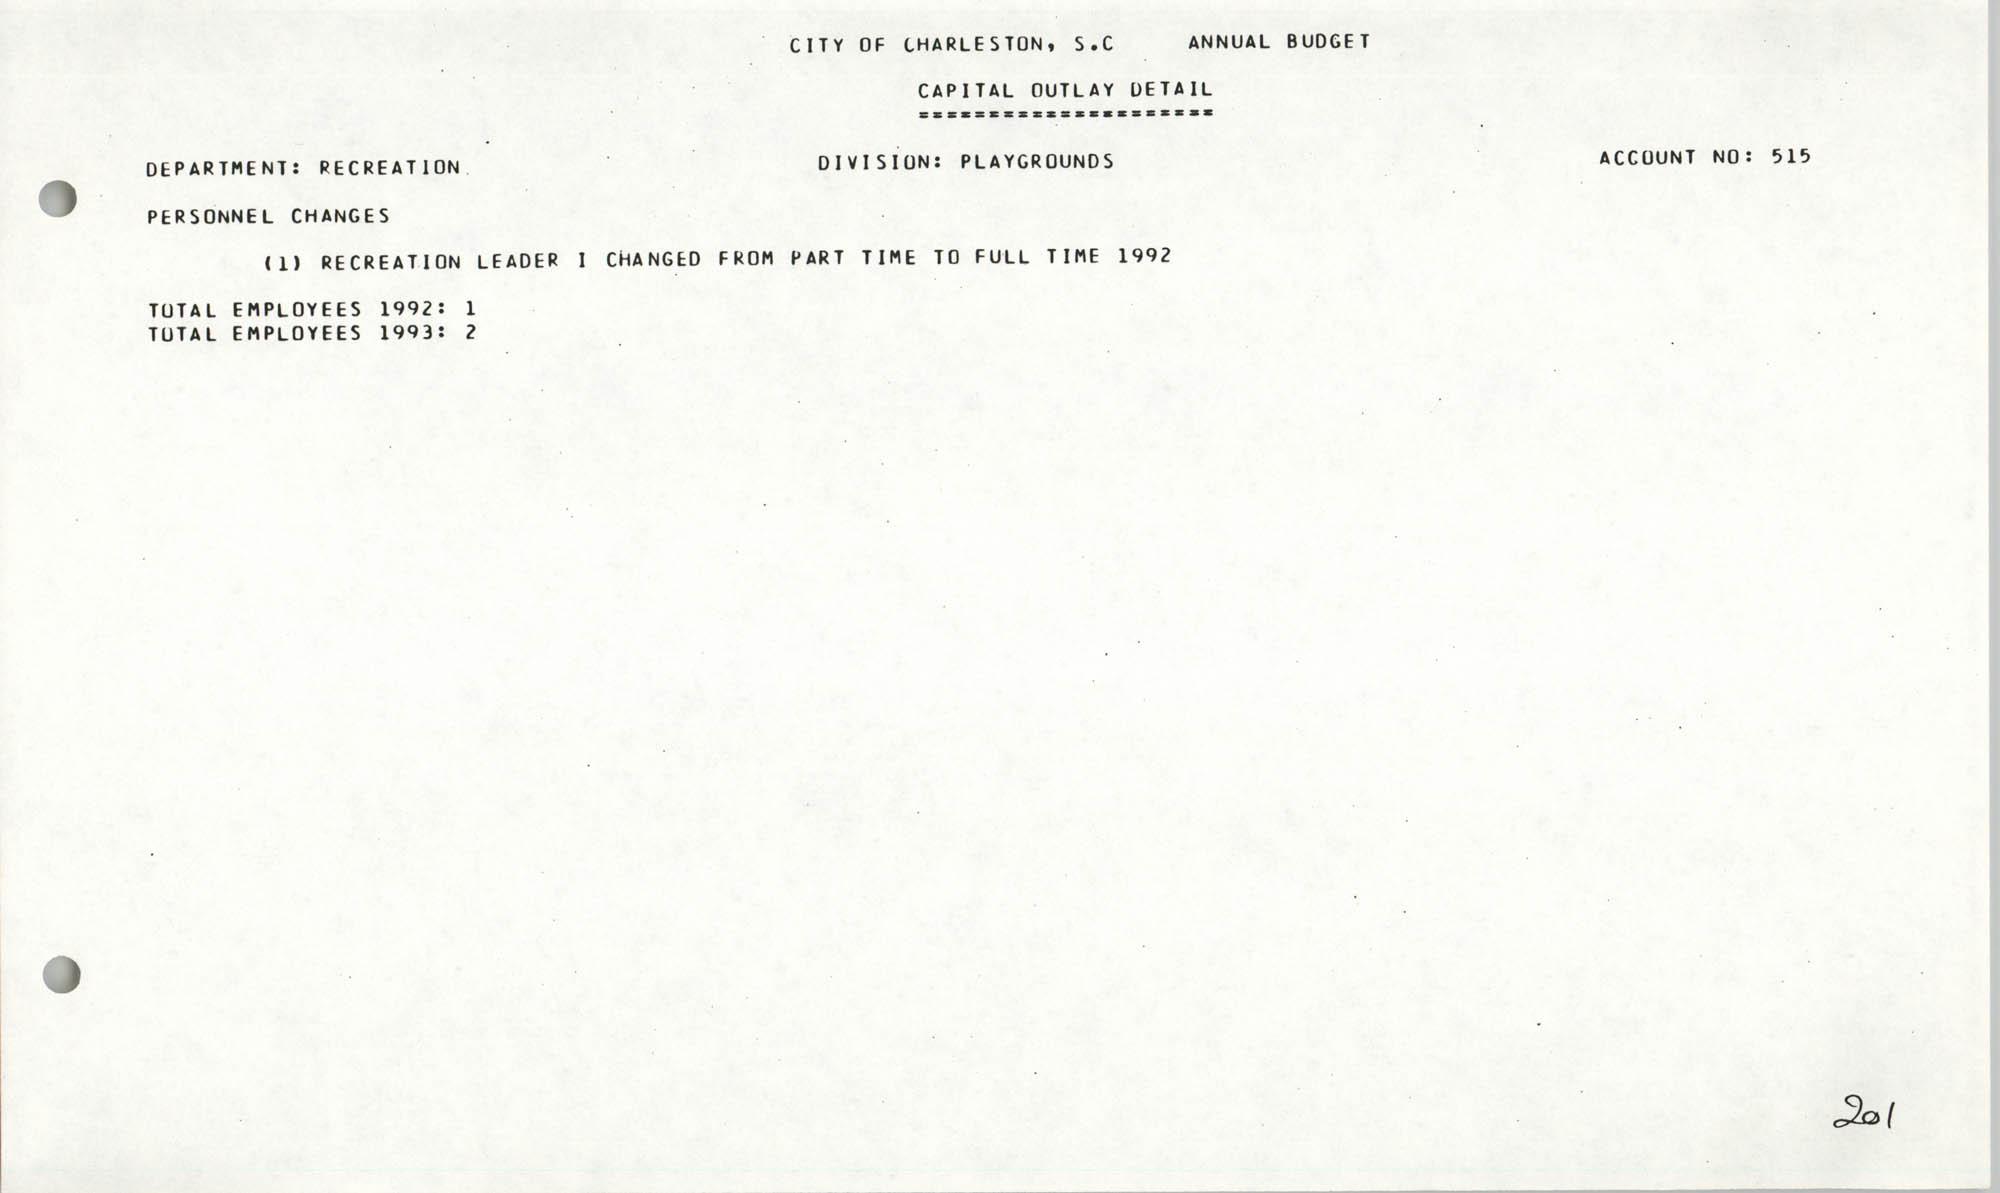 The City Council of Charleston, South Carolina, 1993 Budget, Page 201